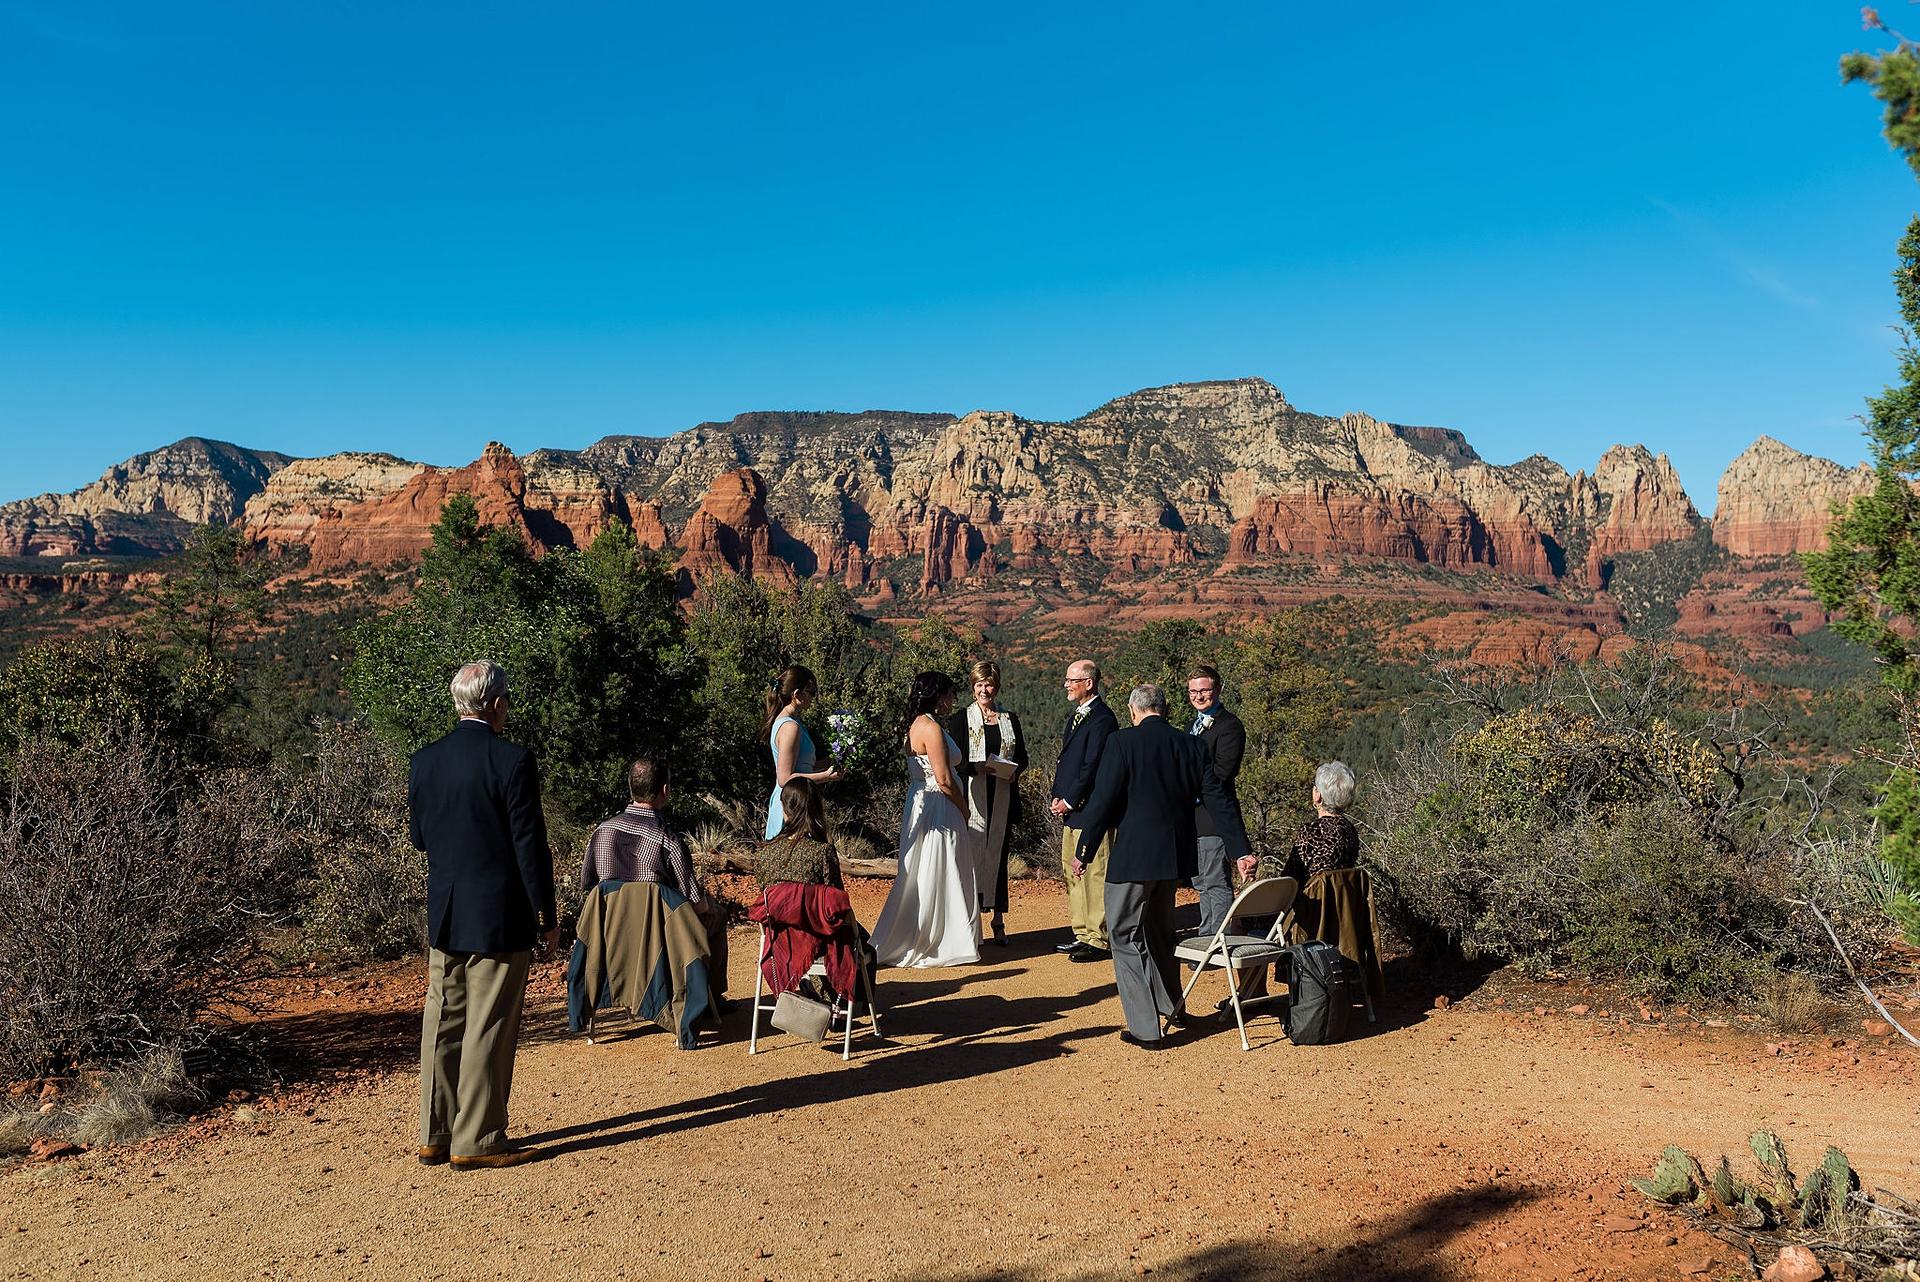 Sedona Elopement Wedding Ceremony Image | An intimate AZ elopement